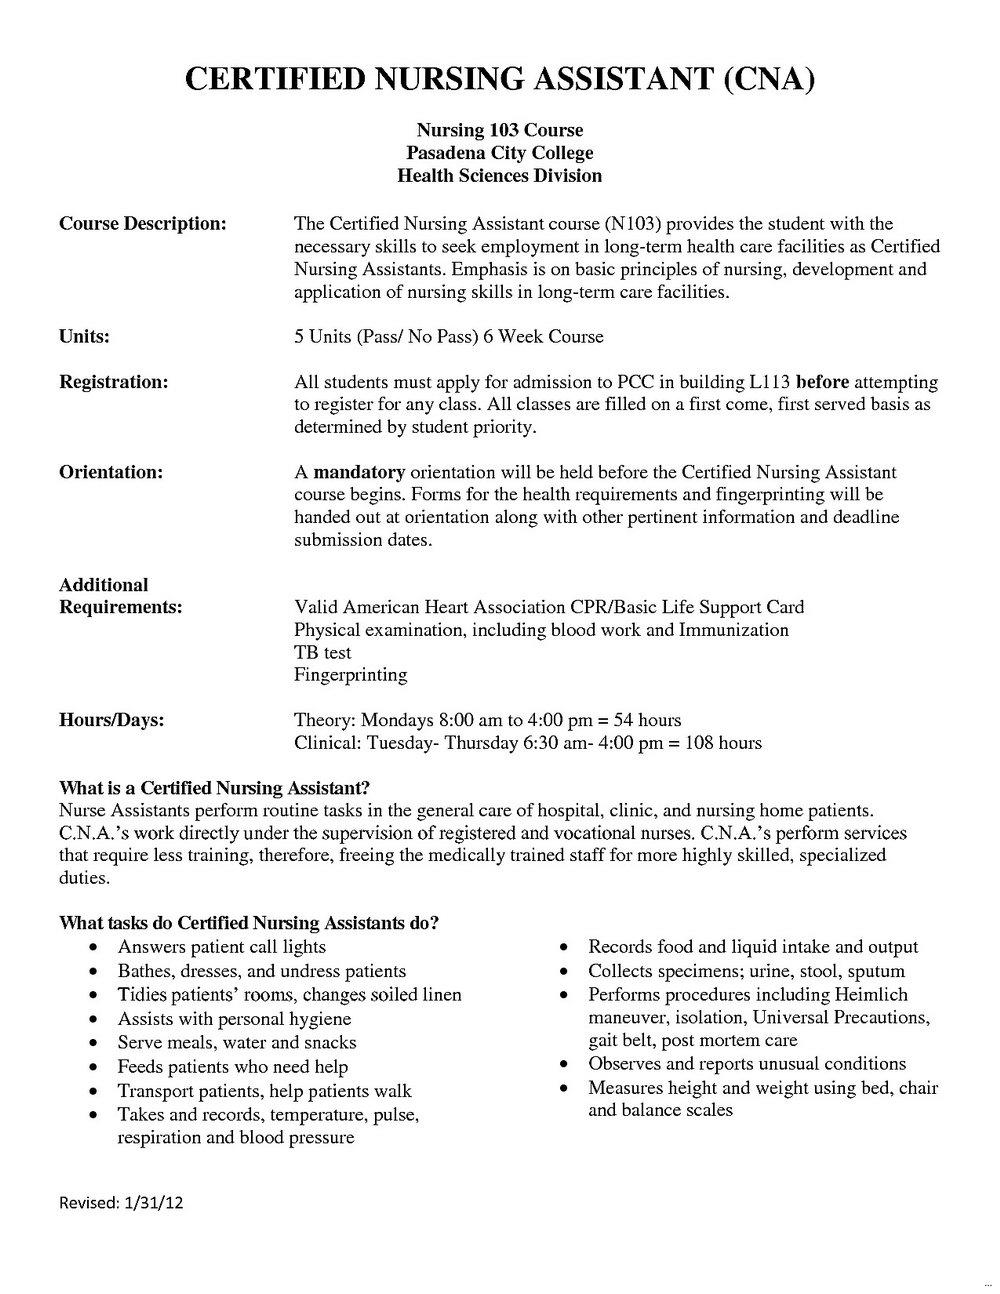 Resume Description For Nursing Assistant